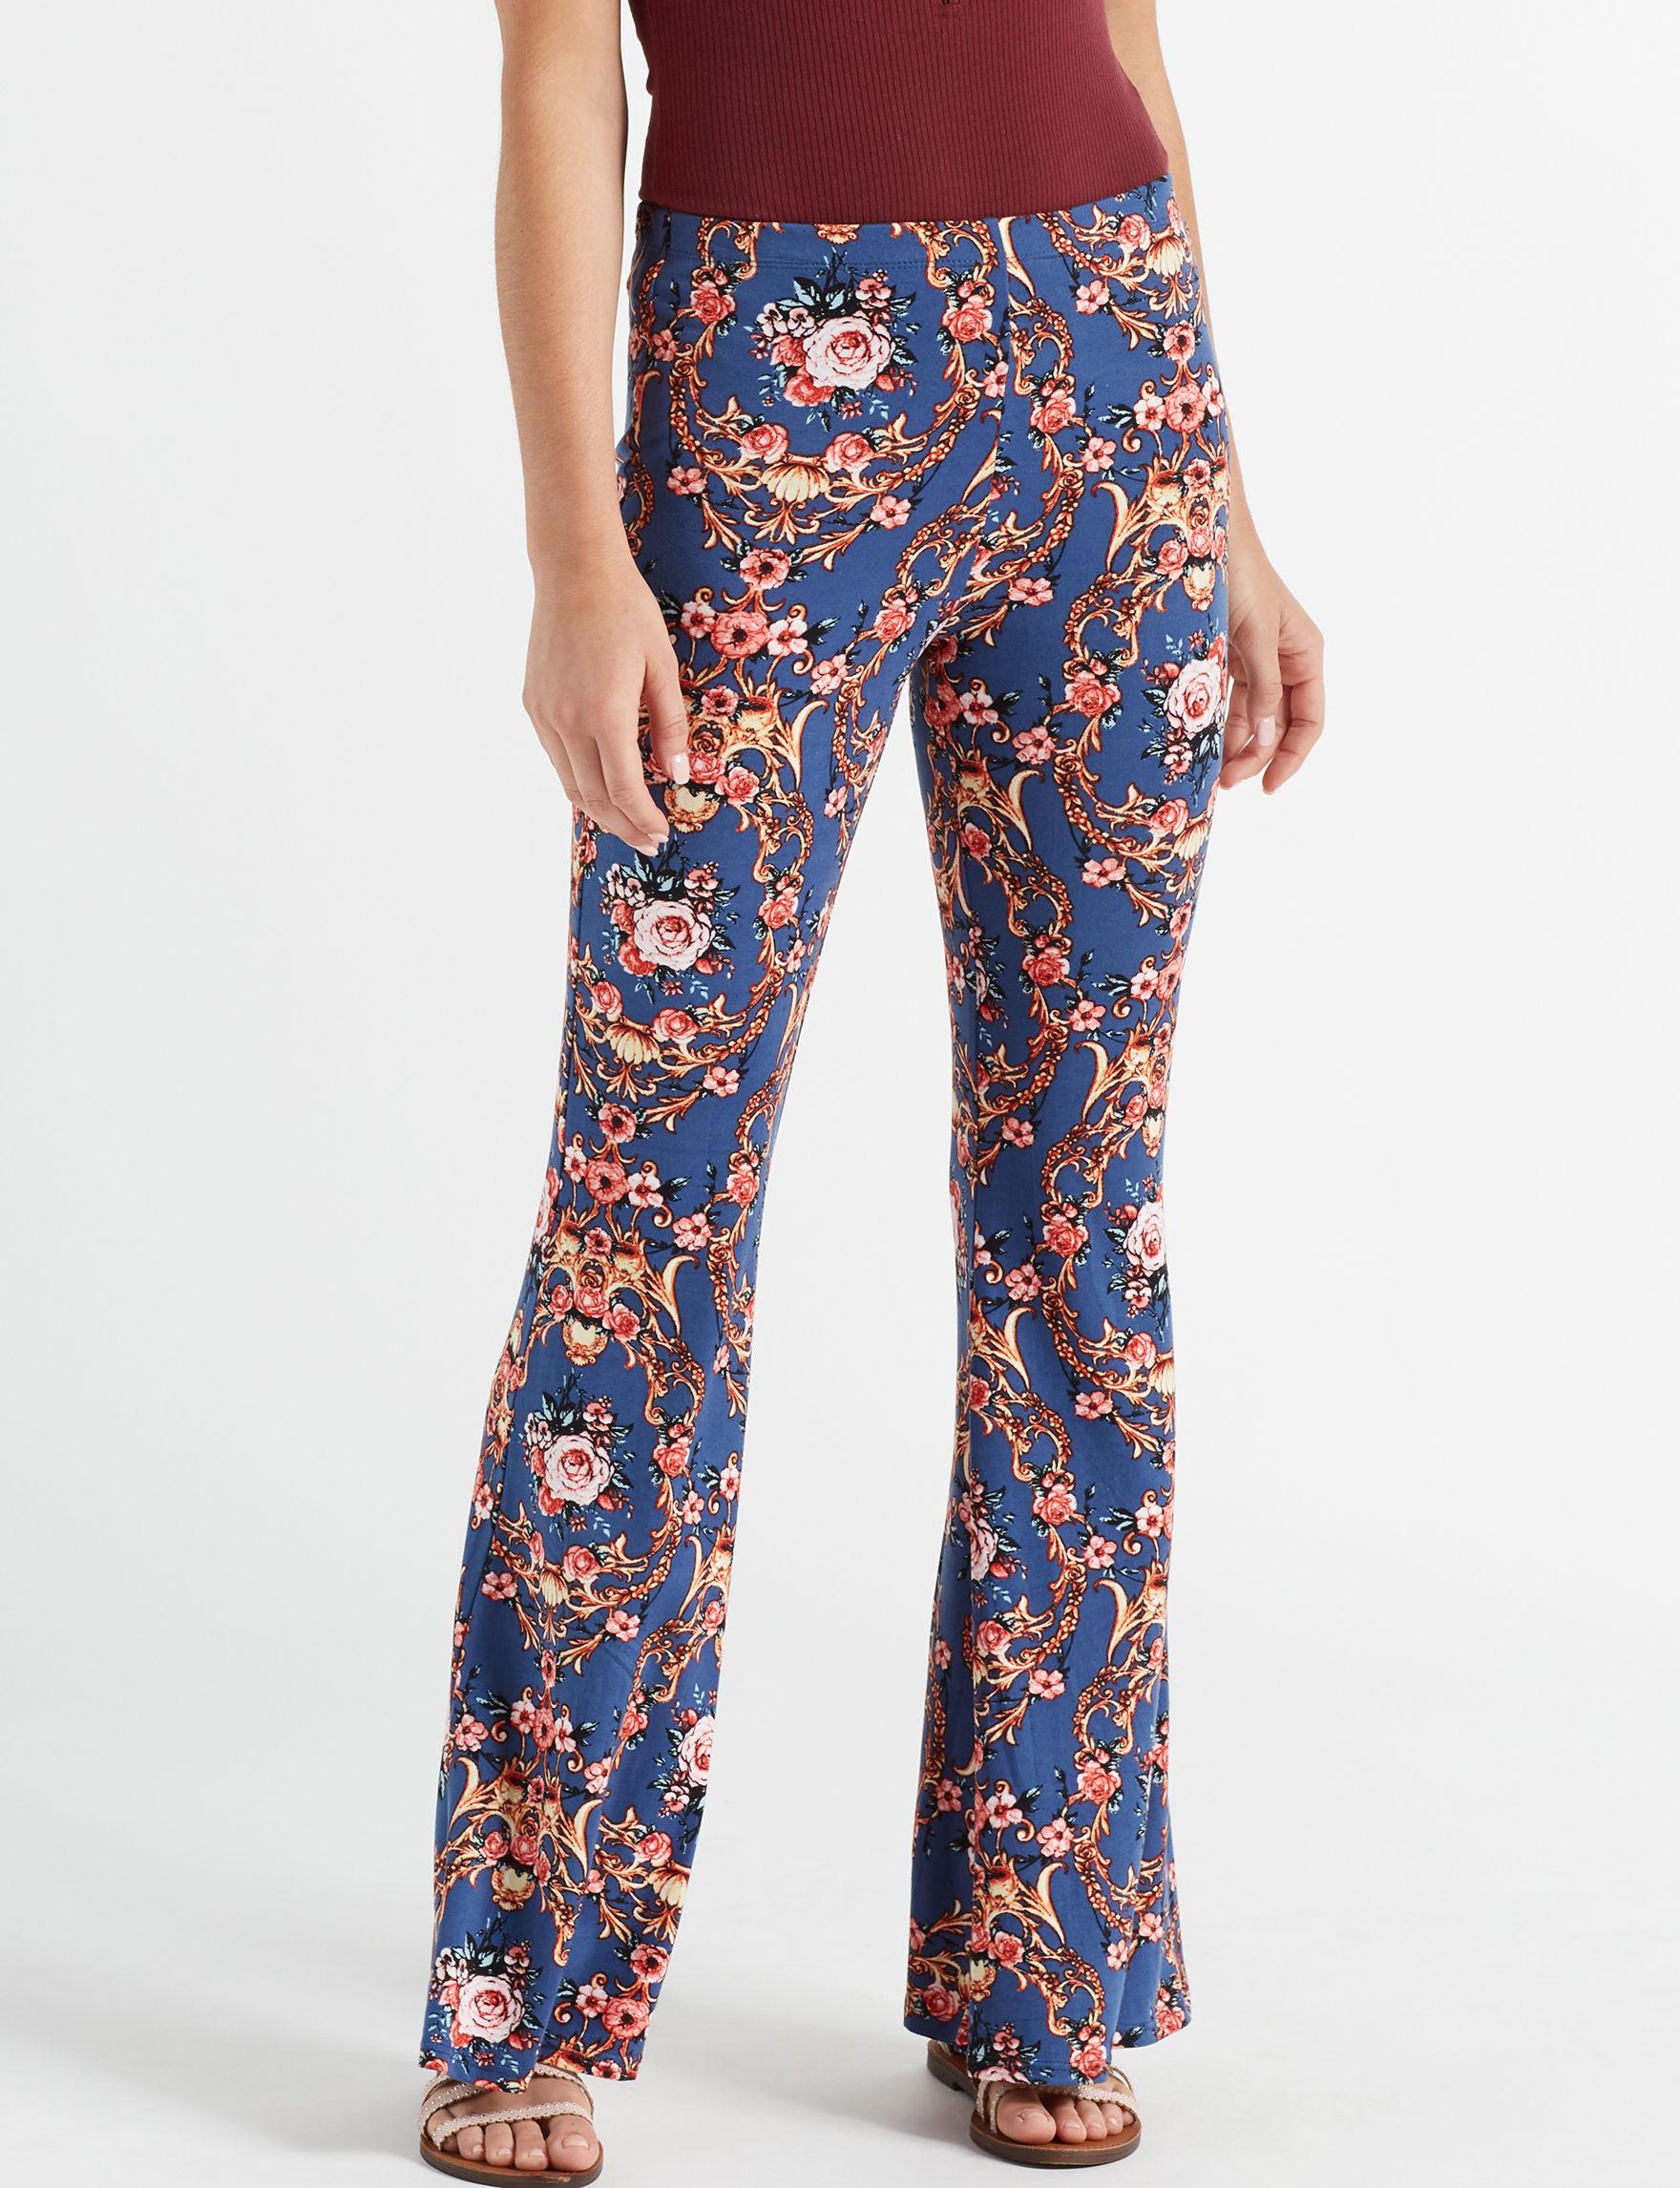 Eye Candy Denim Blue Soft Pants Stretch Wide Leg